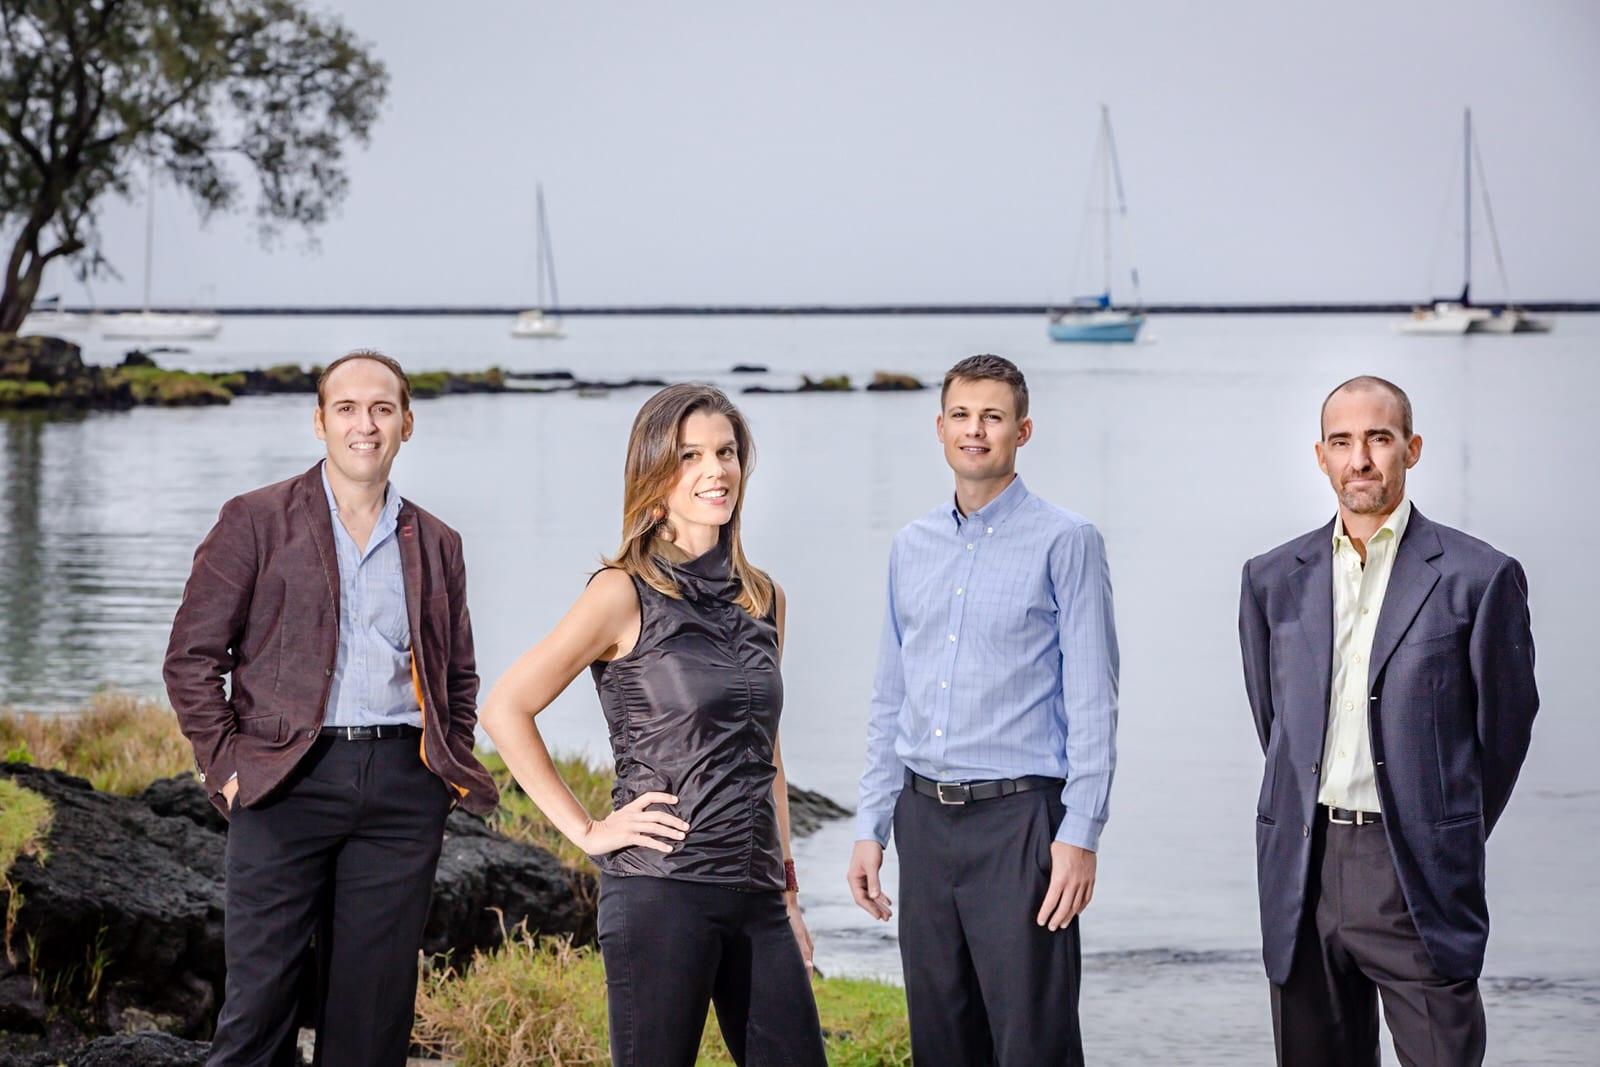 Corporate-Headshots-Team-Hawaii-Big-Island-Photographer.jpg